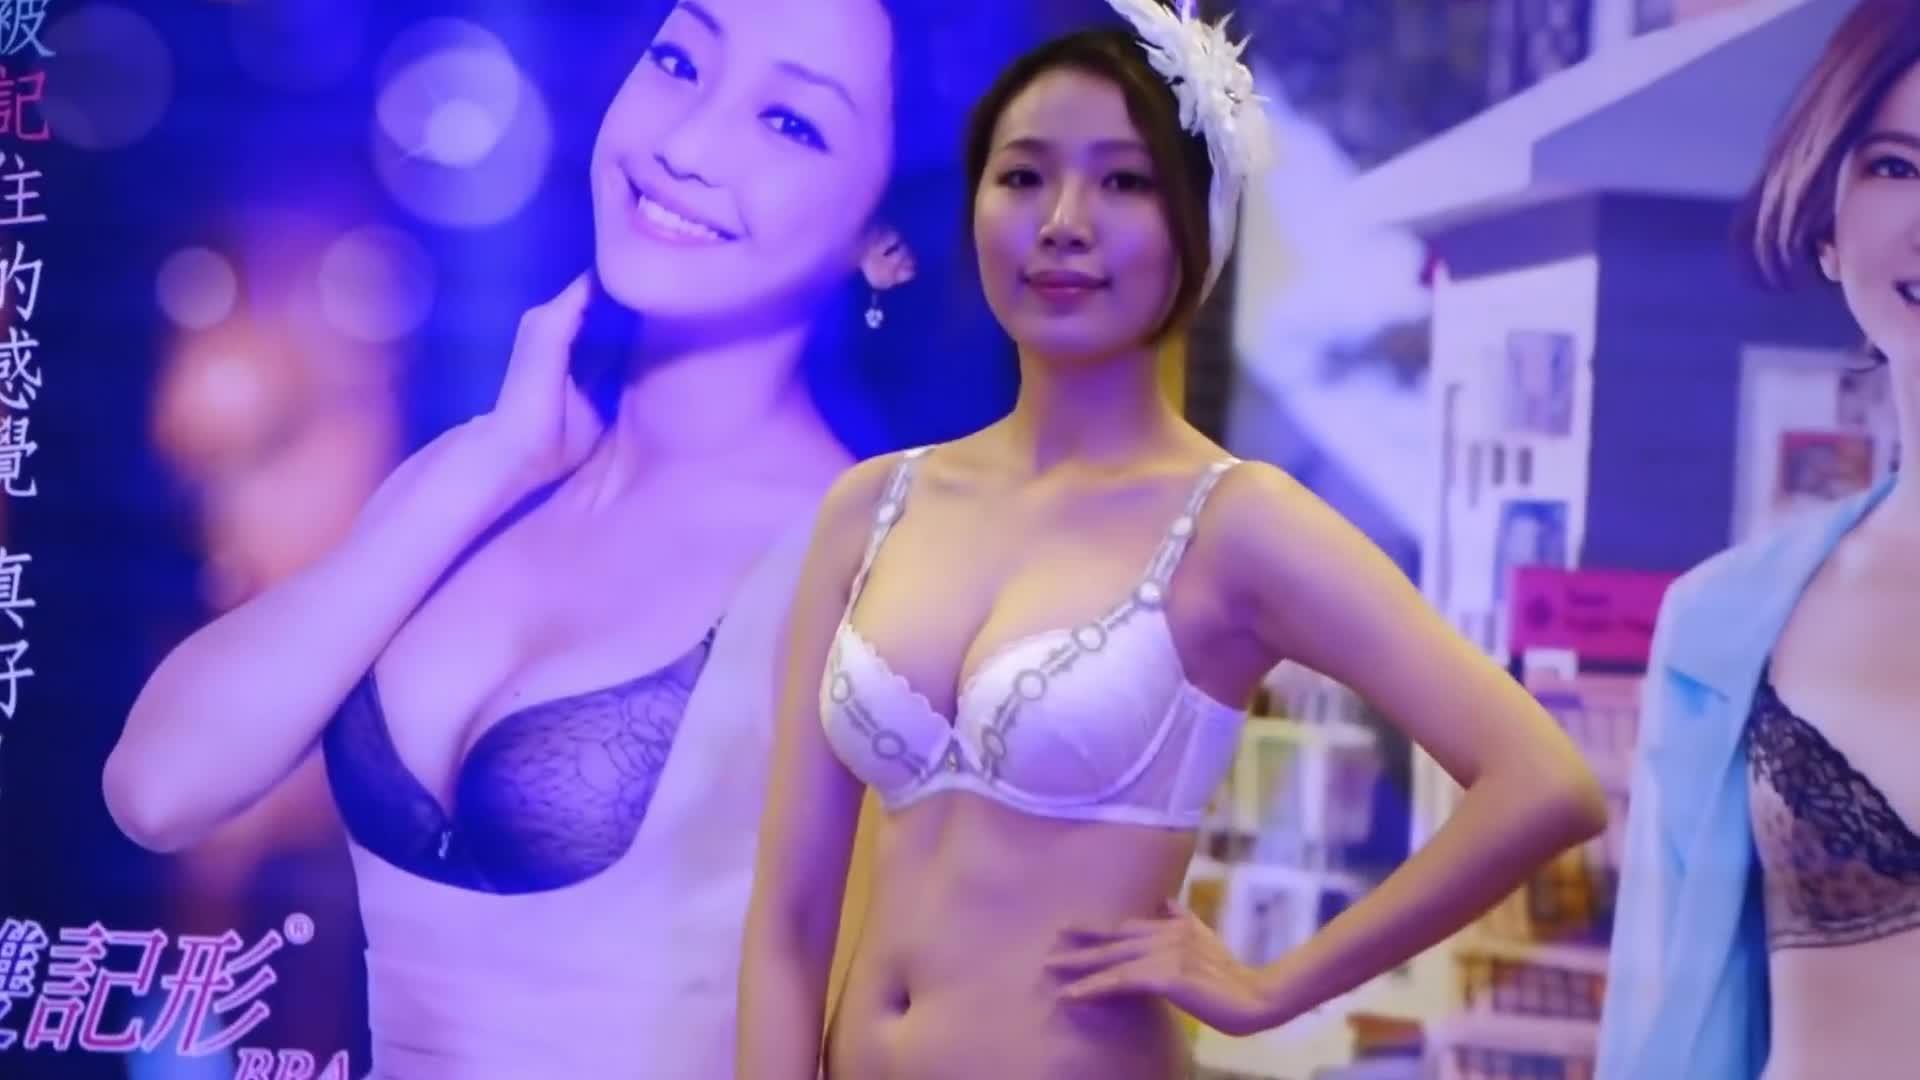 horesm亚时装秀:前卫的国产美女模特,身姿艳丽不输